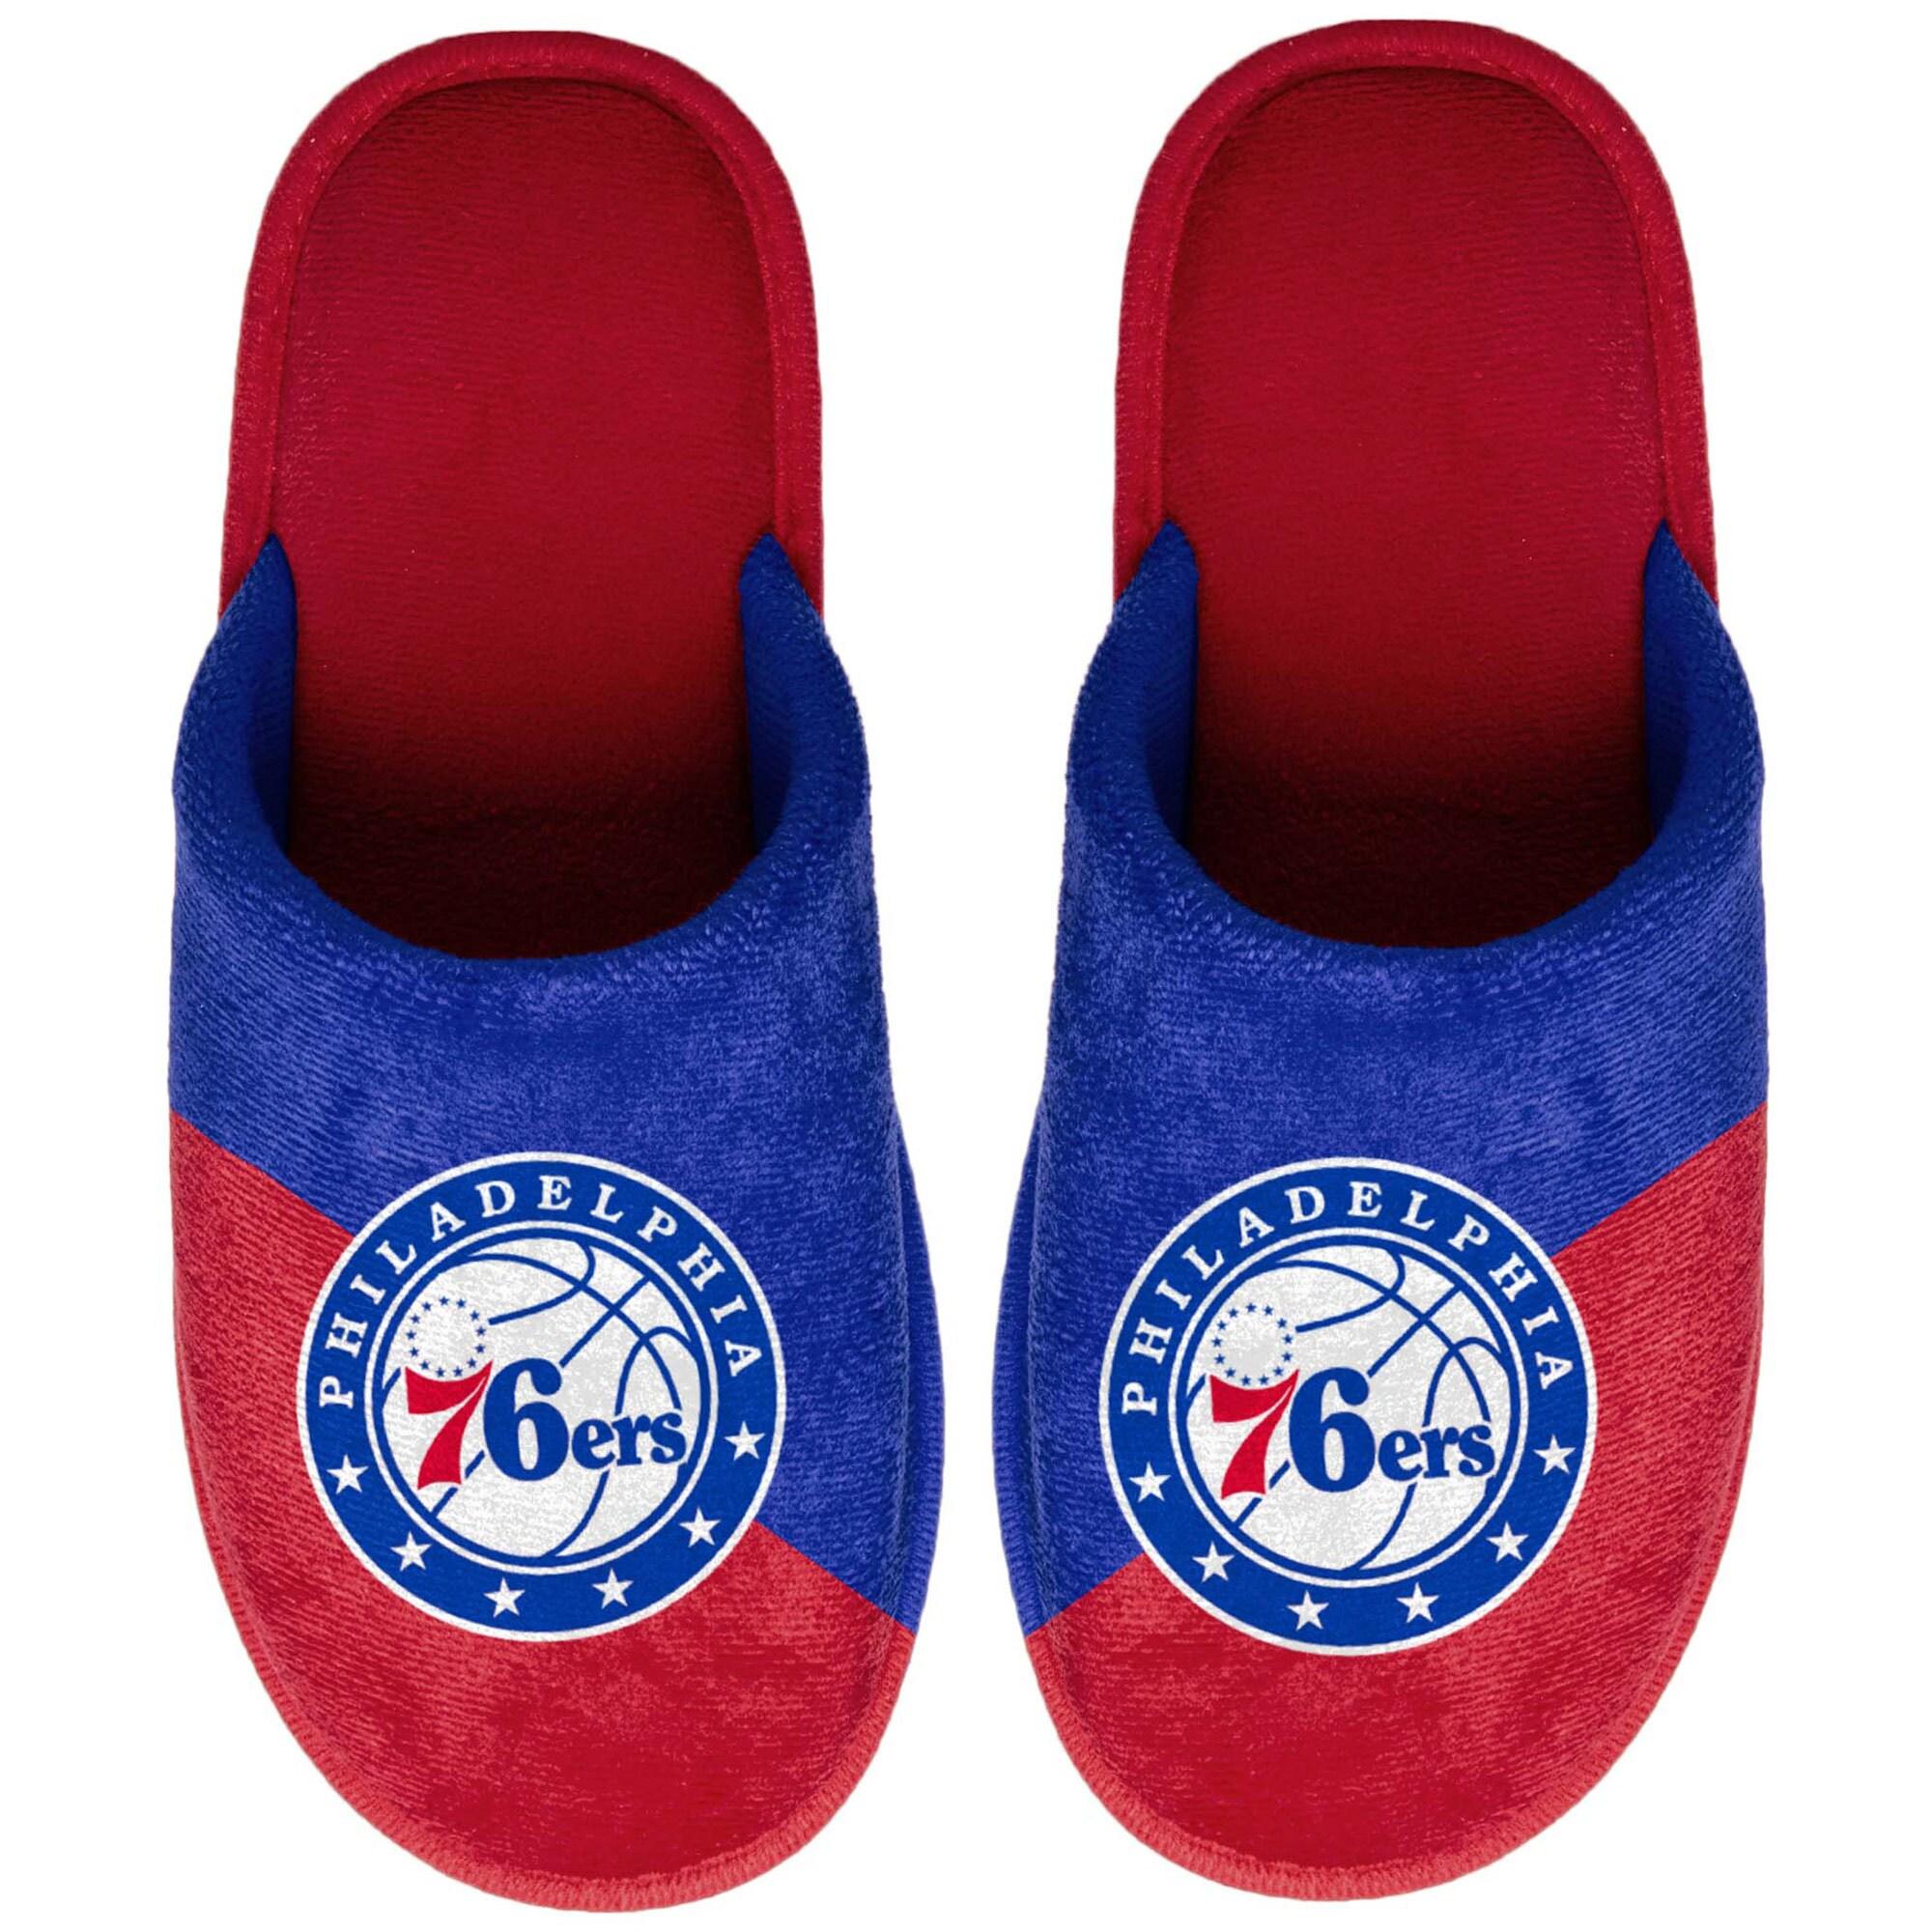 Philadelphia 76ers Big Logo Scuff Slippers